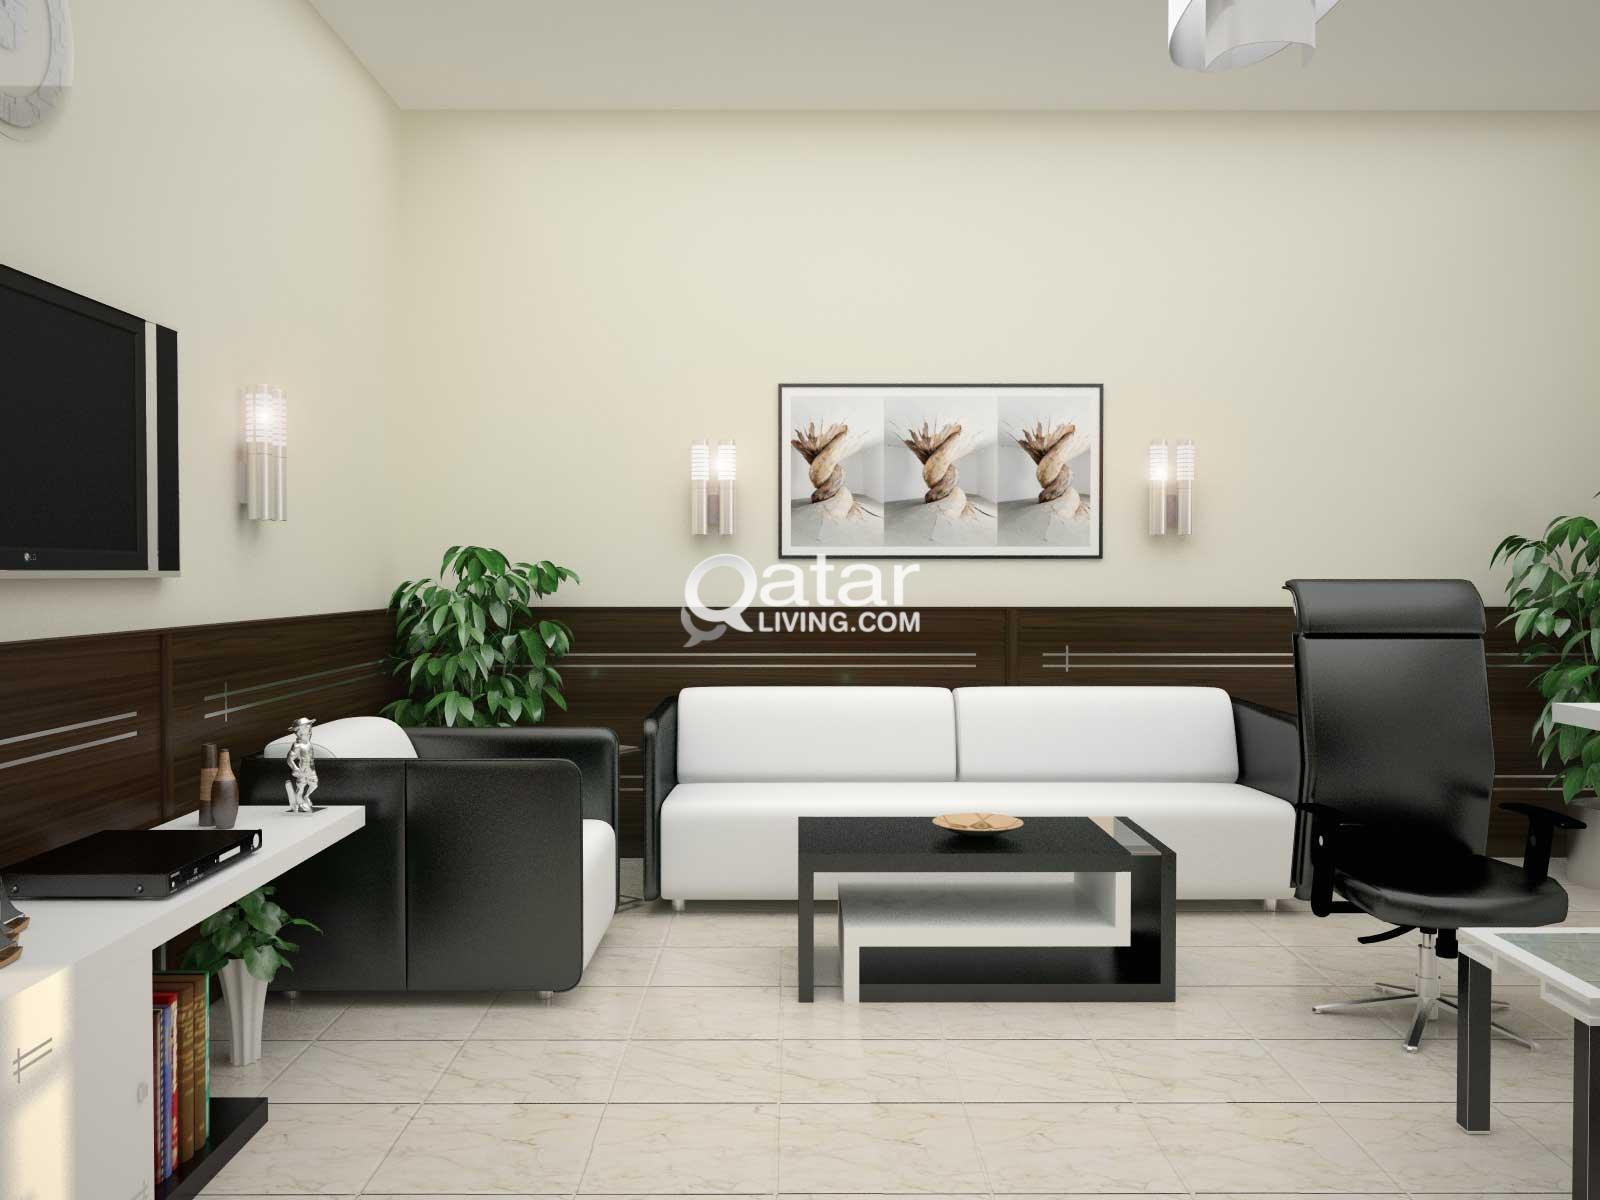 Interior Designer Draftsman Looking For A Job Qatar Living